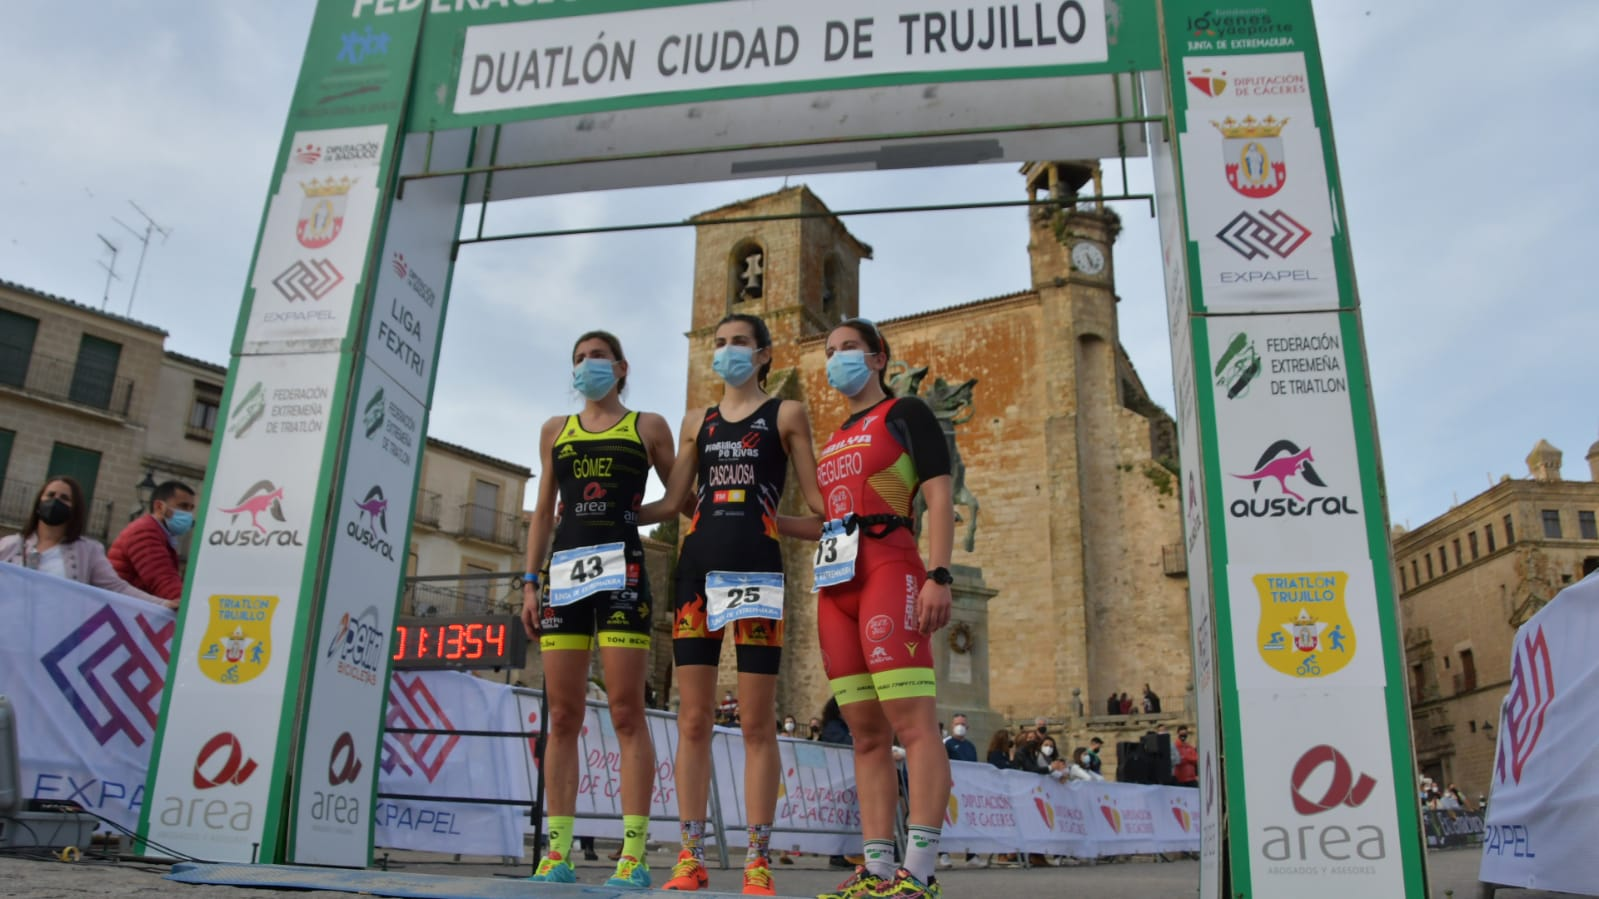 podio femenino I Duatlón Ciudad de Trujillo